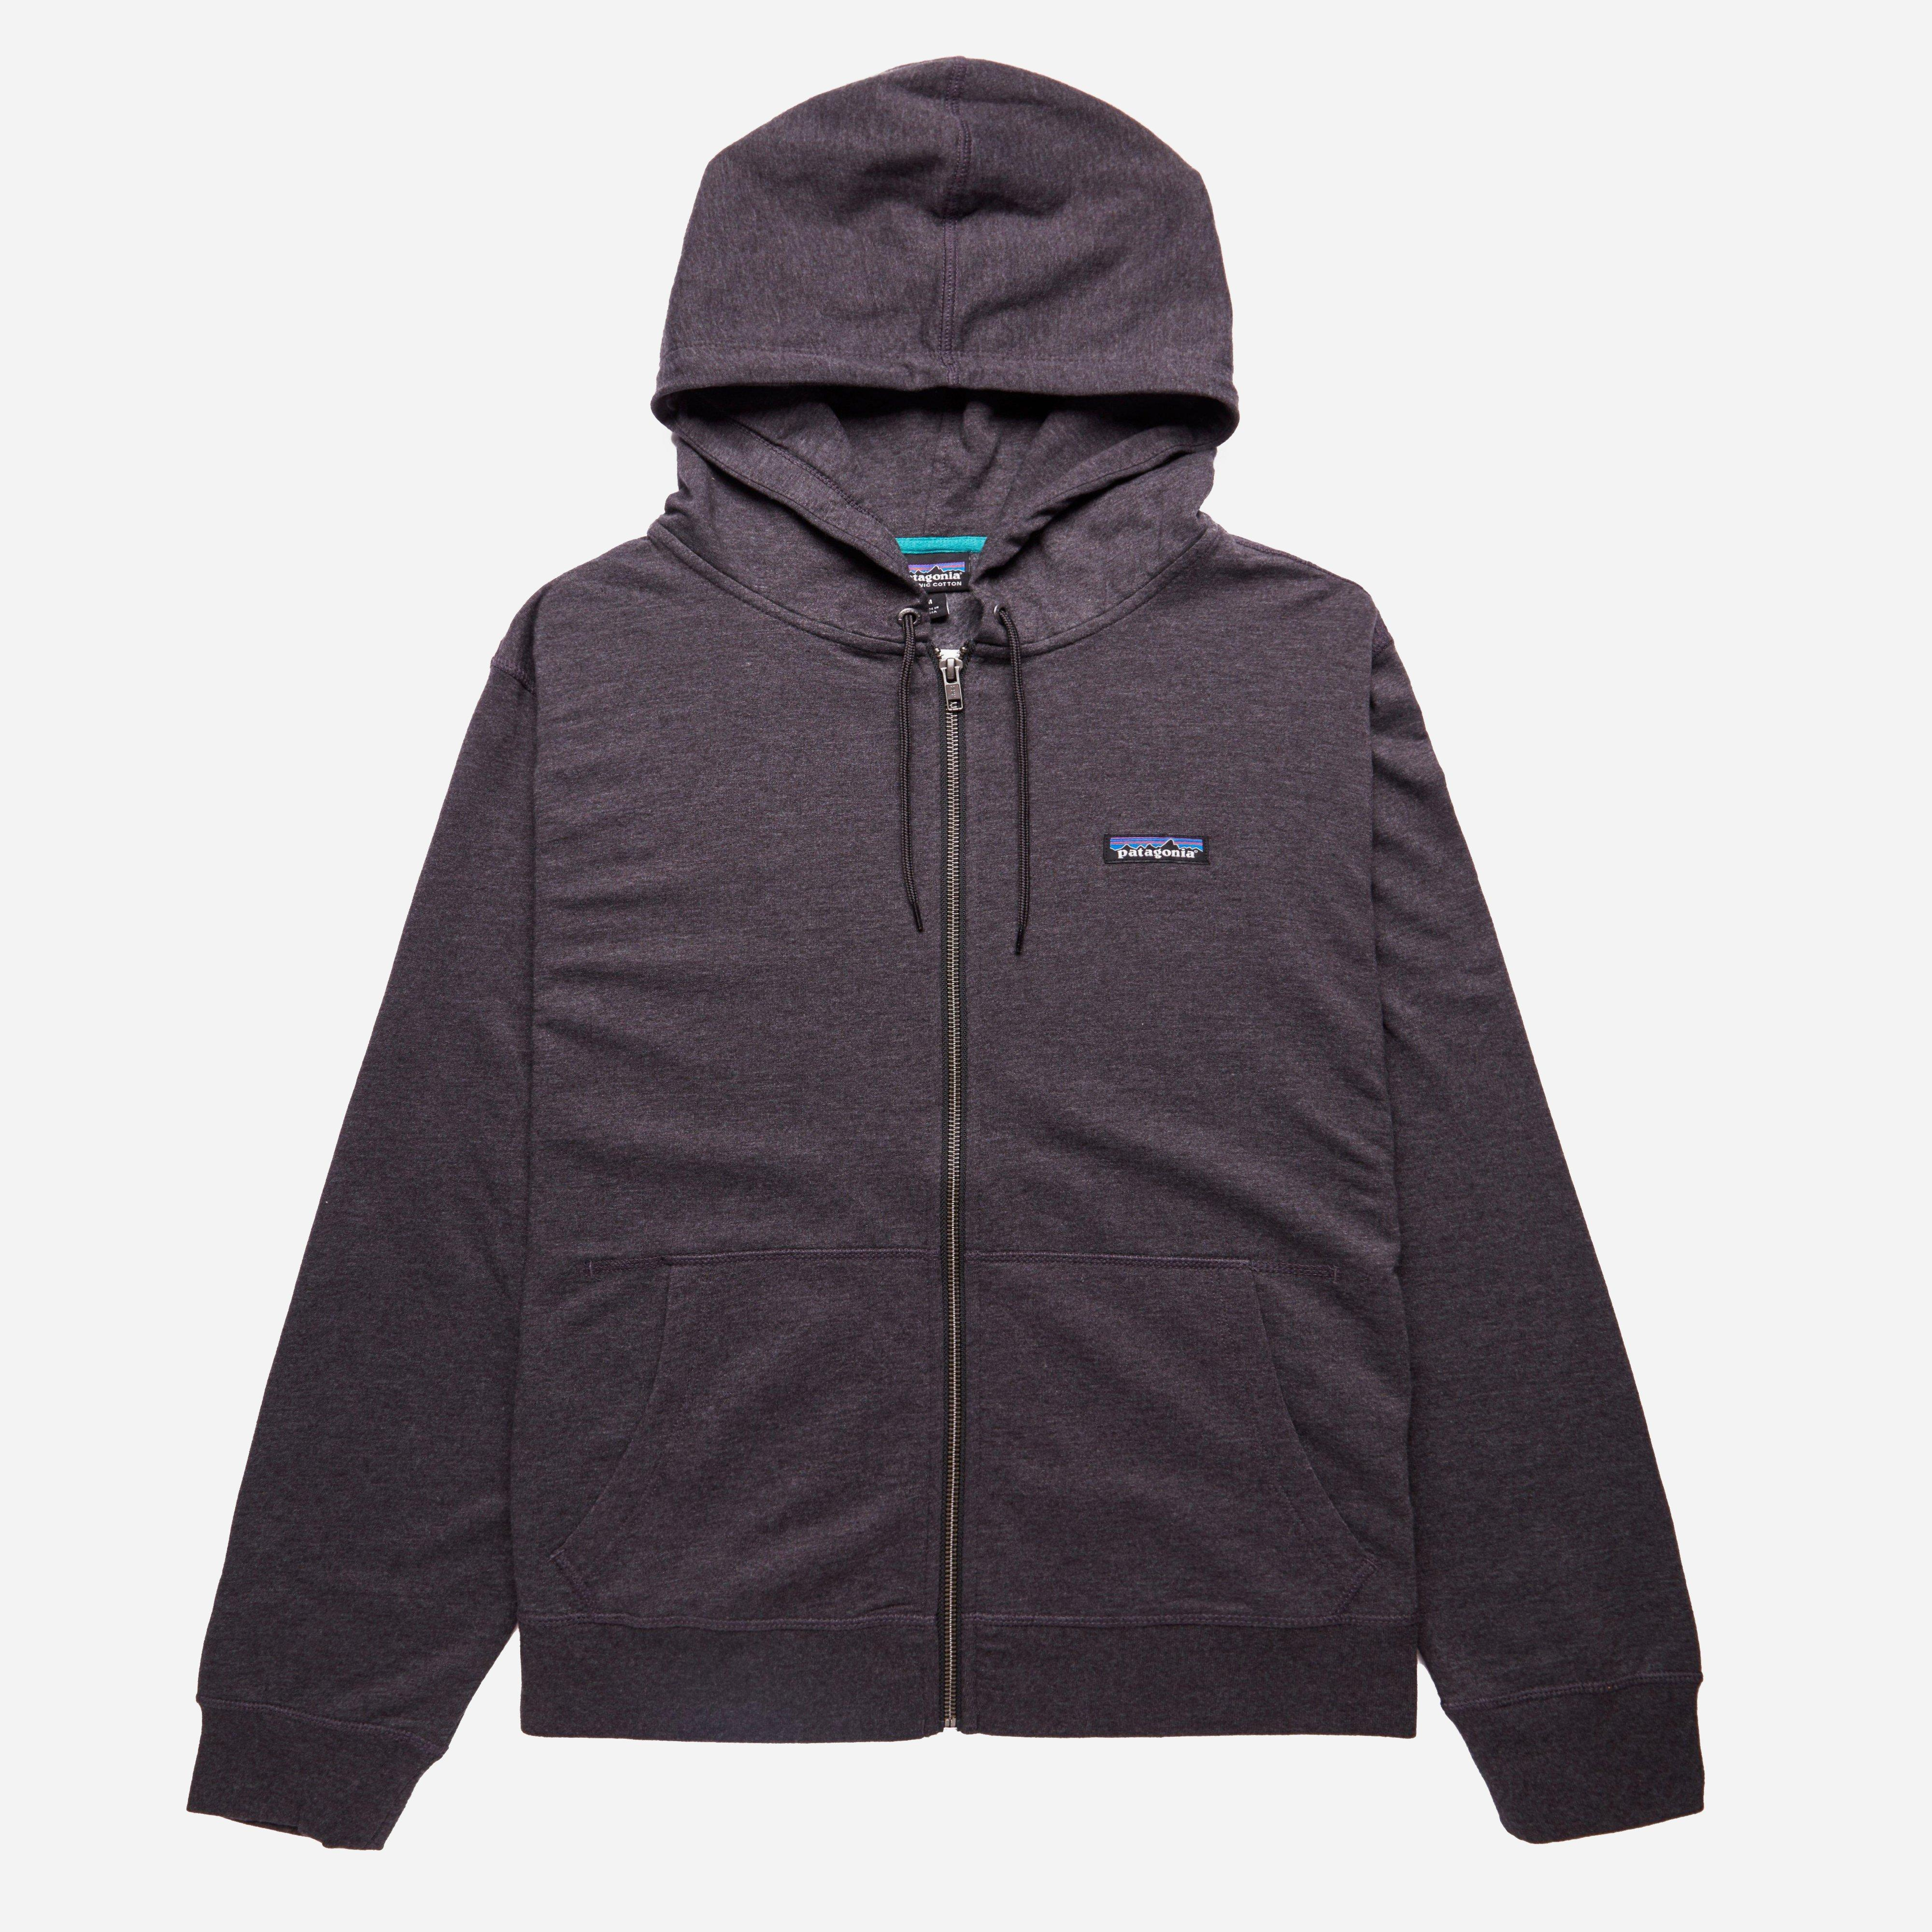 Patagonia M's Lightweight Full Zip Hoody